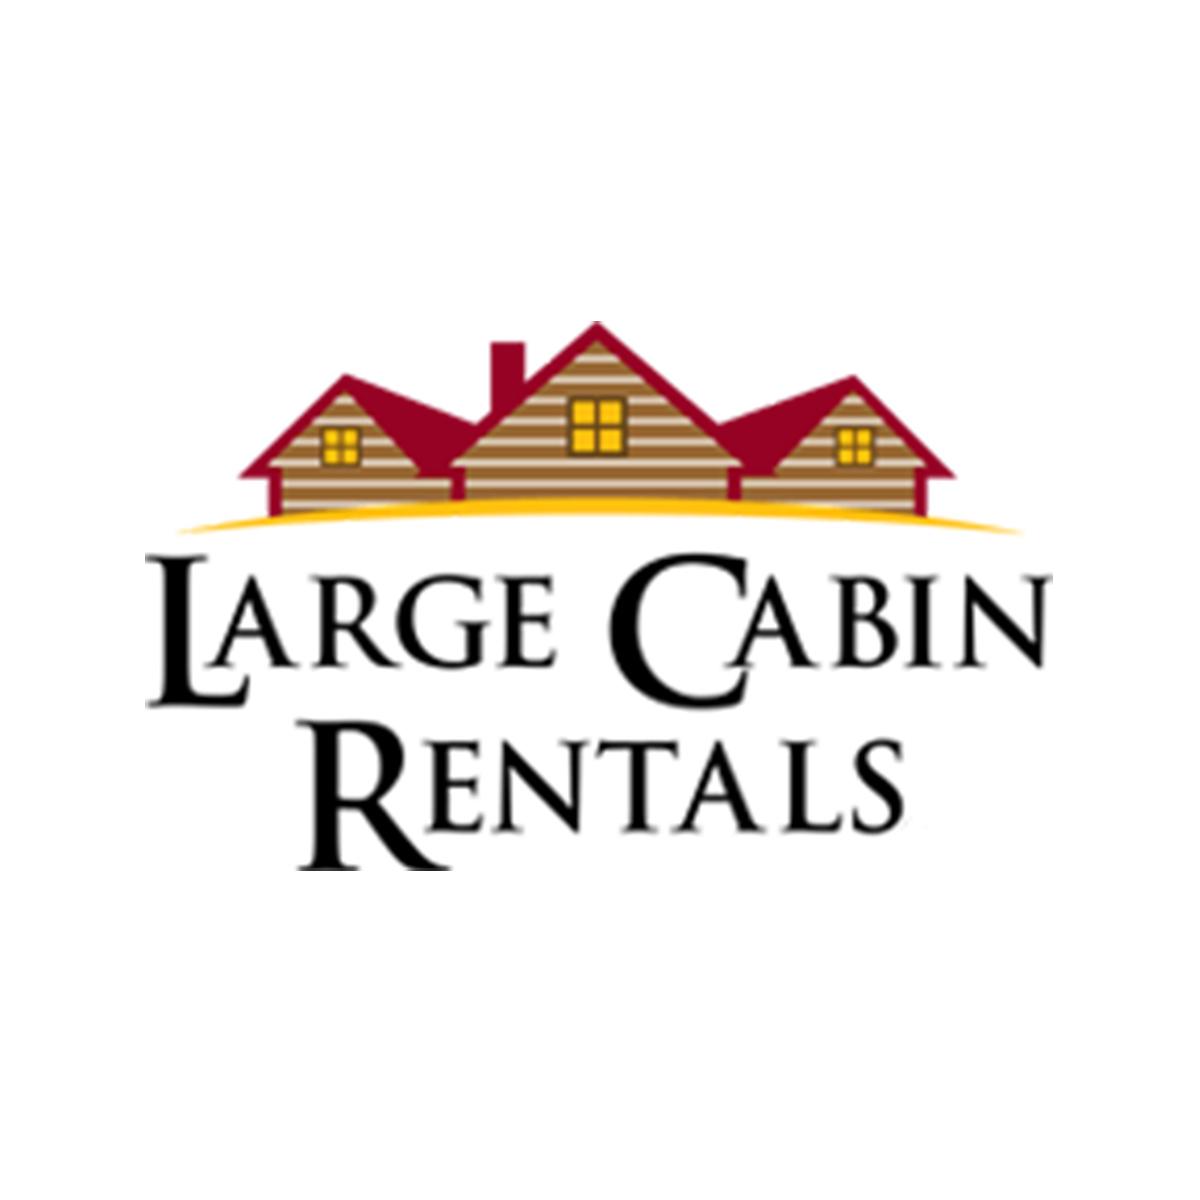 Large Cabin Rentals 2019 SMCB Logo.jpg